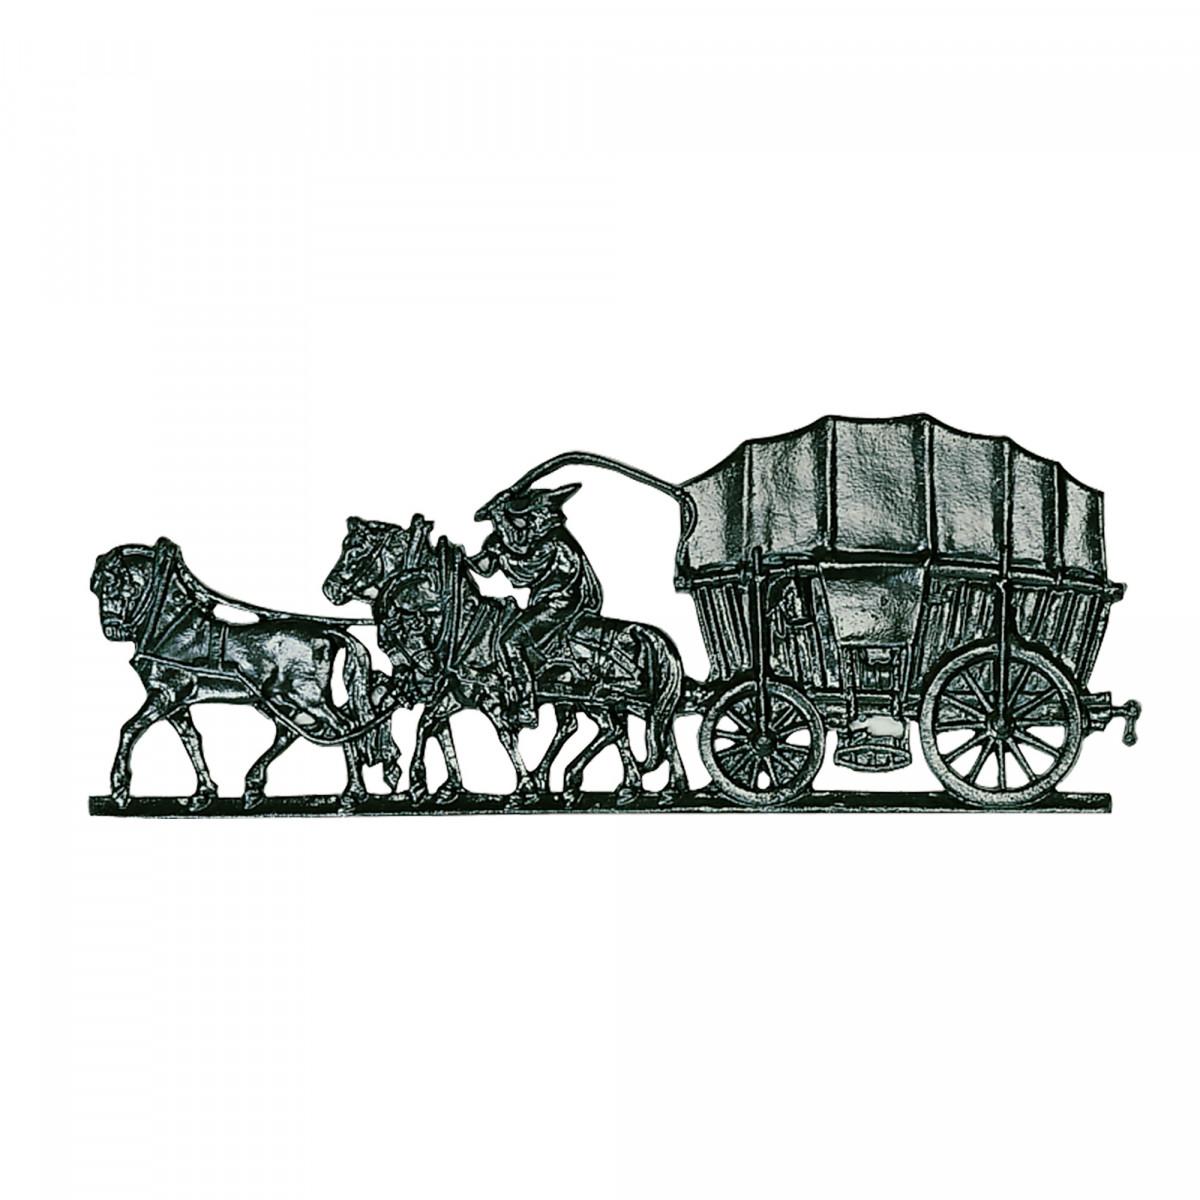 Image of 0 52 Paard & koets ornament